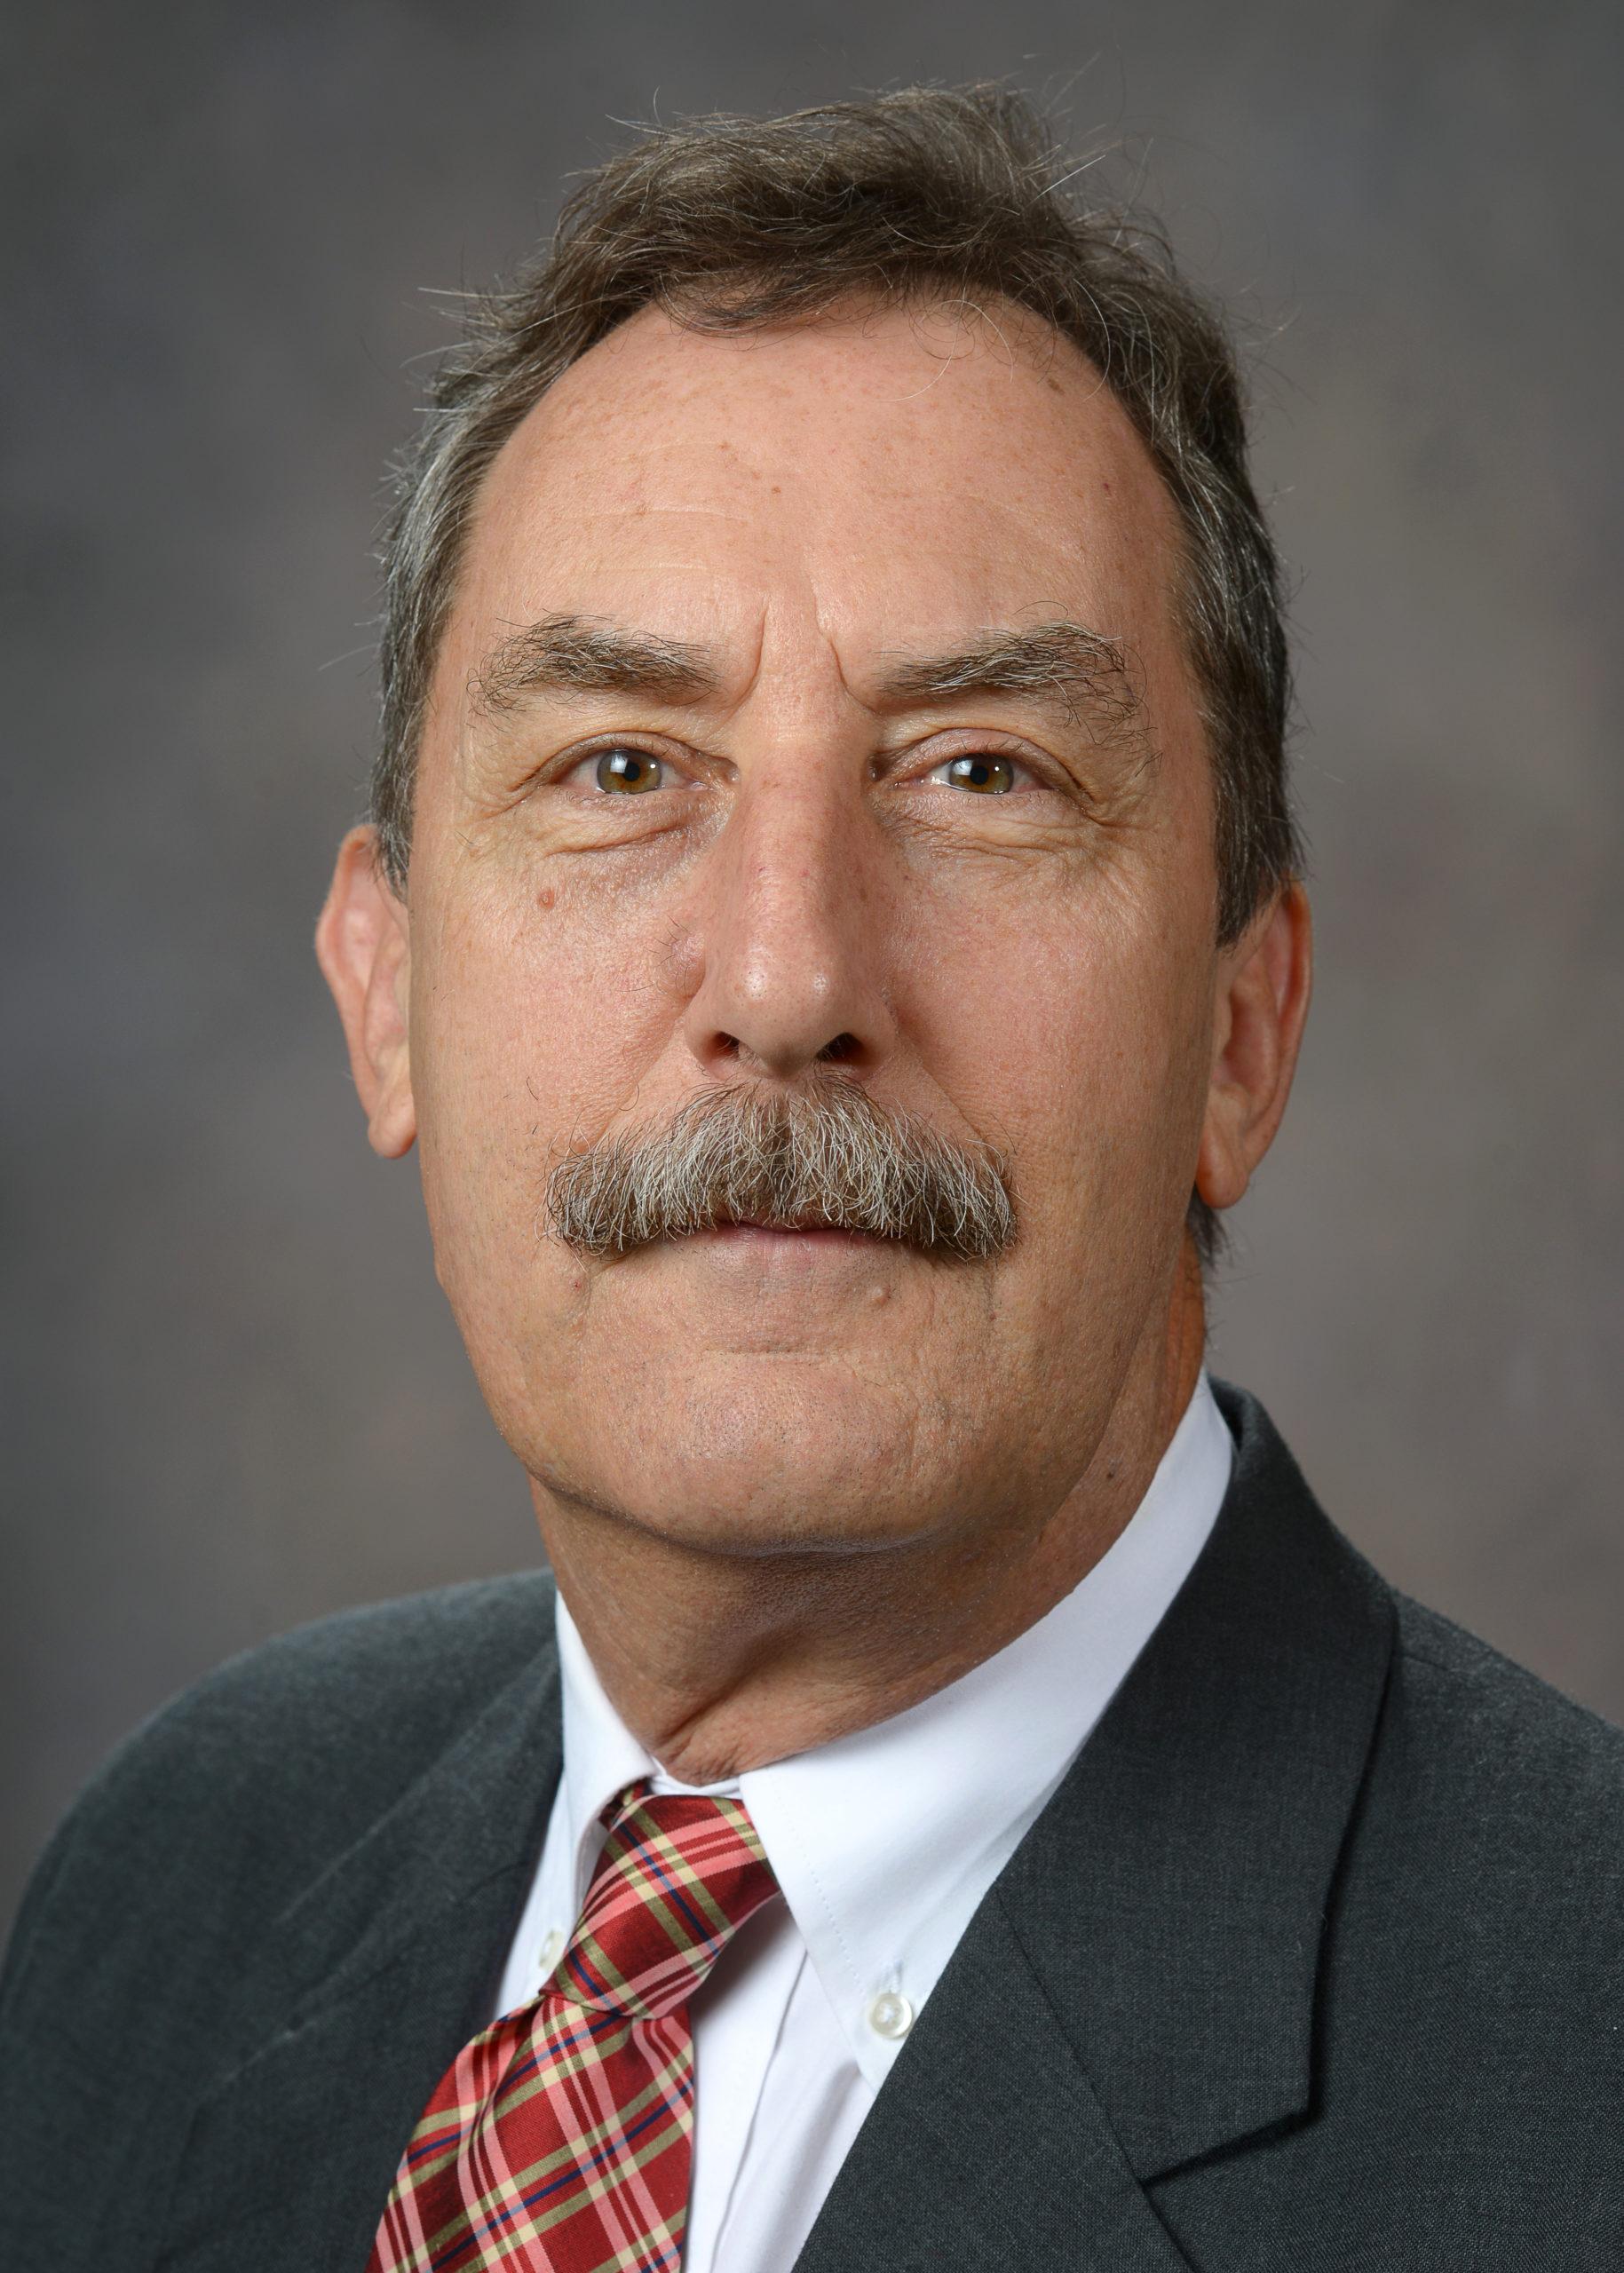 Carl Motsenbocker